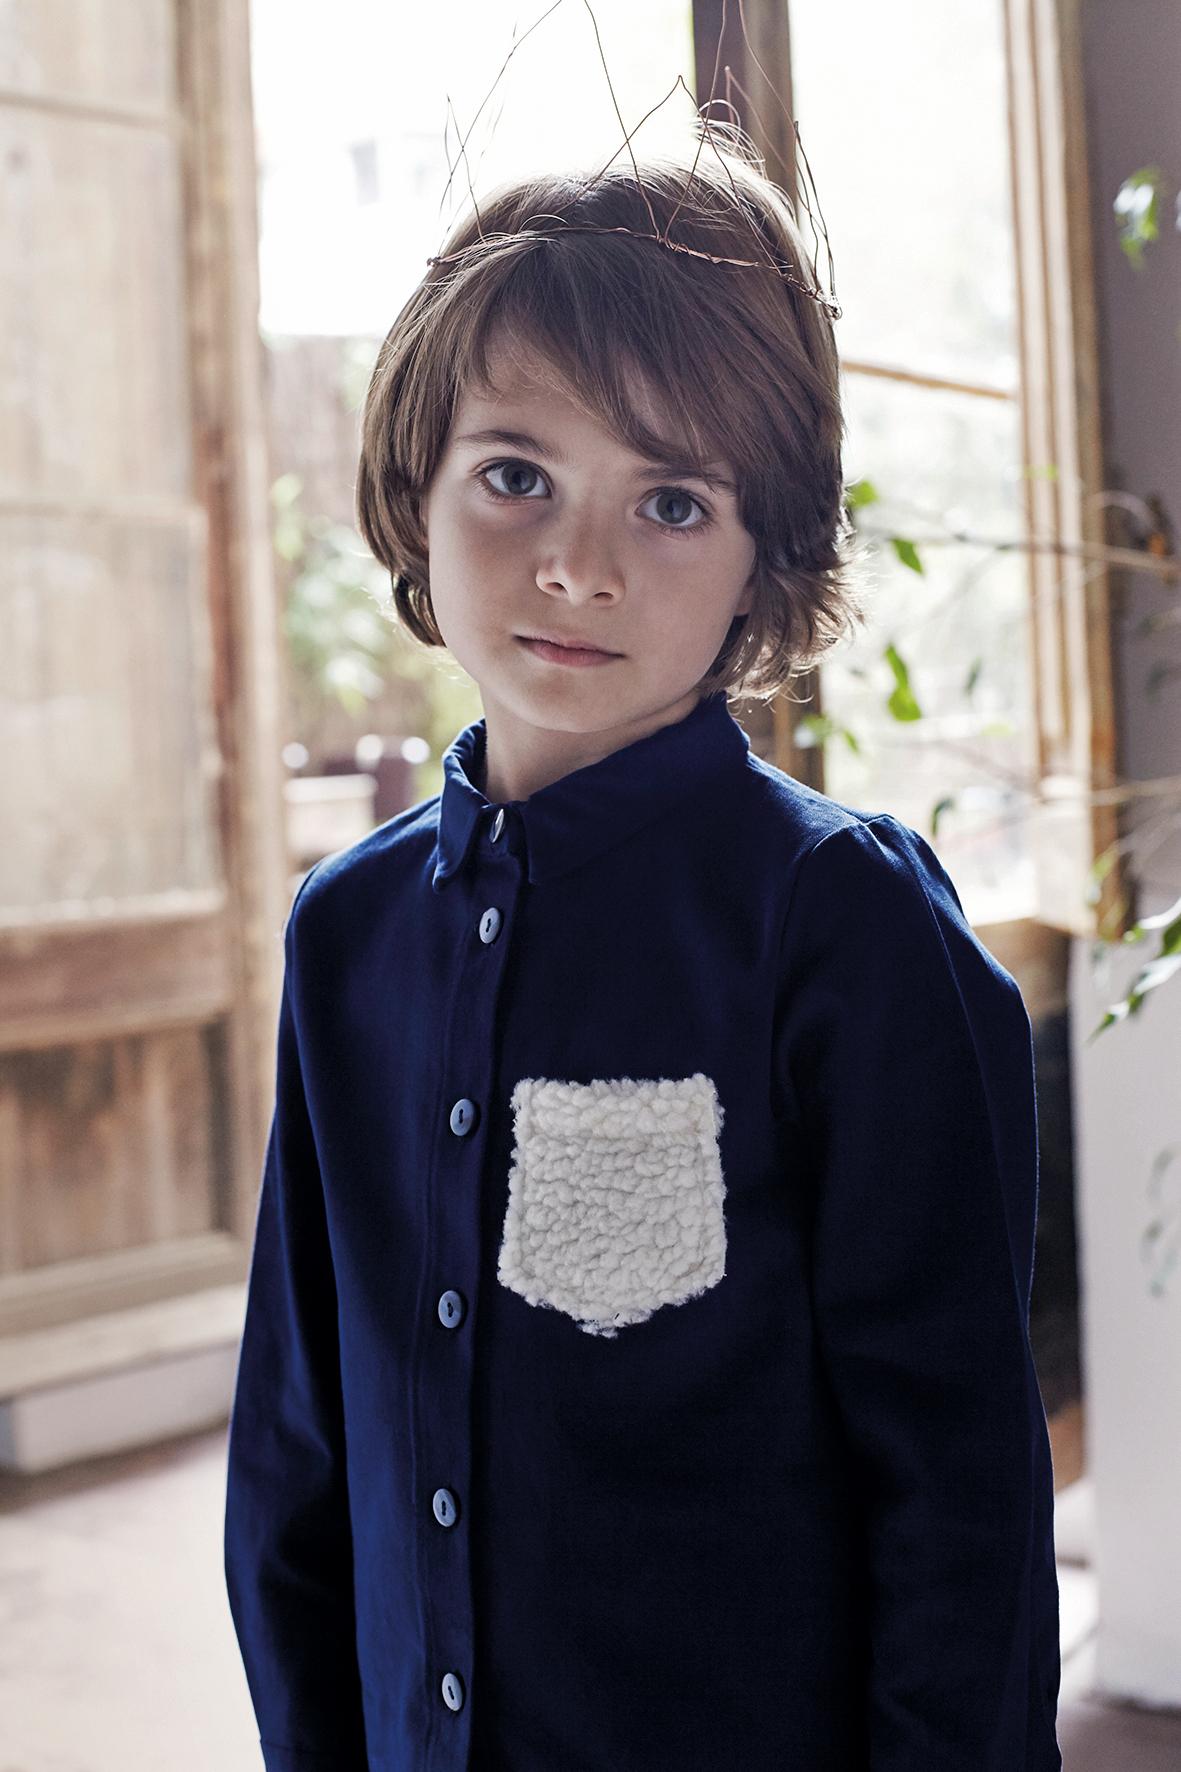 Les petits vagabonds: König der Räuber Hemd mit Brusttasche aus Teddystoff (55 €) www.lespetitsvagabonds.com